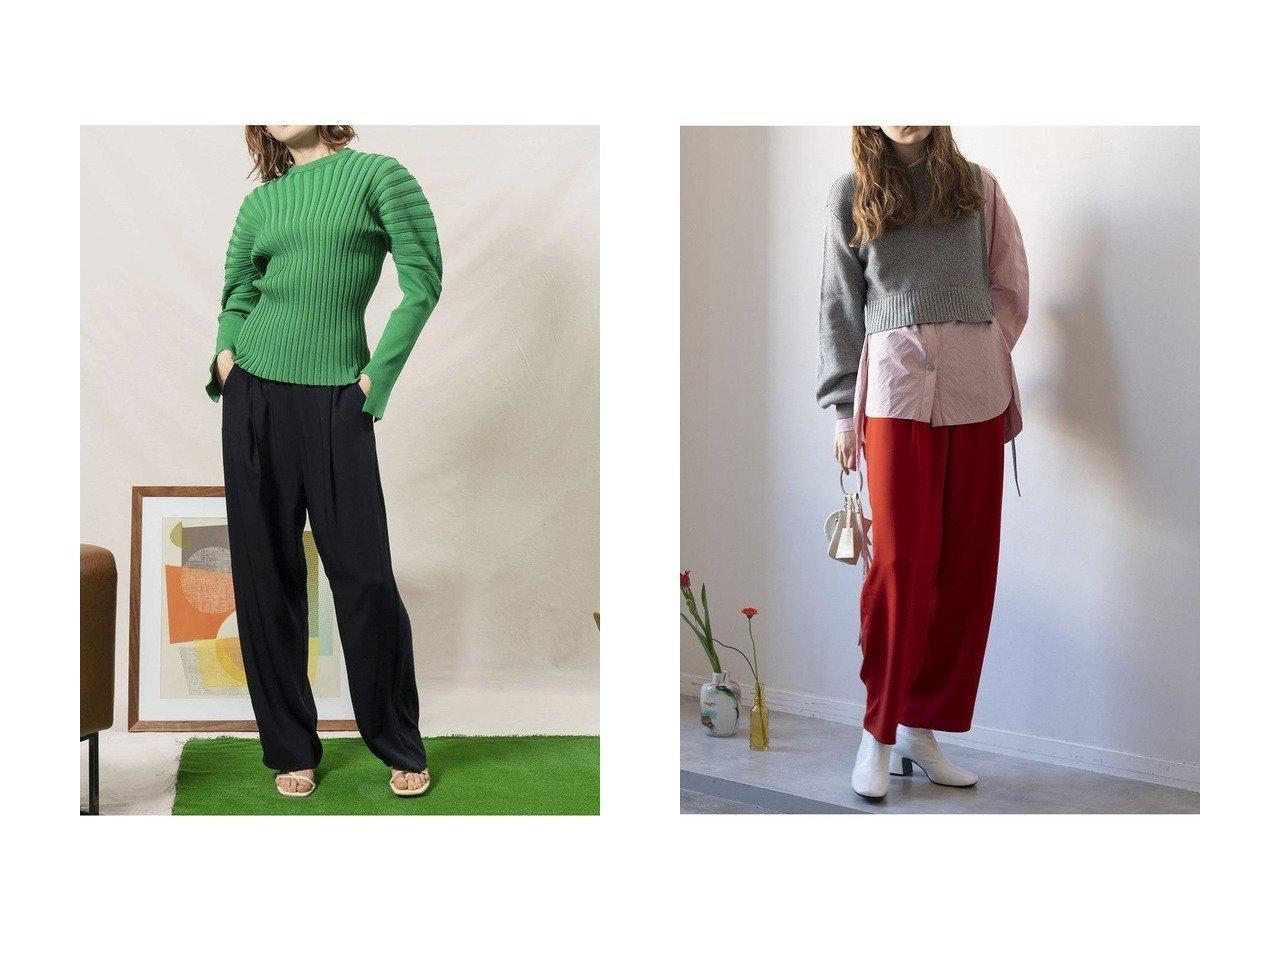 【MAISON SPECIAL/メゾンスペシャル】のワイドストレートイージーパンツ パンツのおすすめ!人気、トレンド・レディースファッションの通販 おすすめで人気の流行・トレンド、ファッションの通販商品 メンズファッション・キッズファッション・インテリア・家具・レディースファッション・服の通販 founy(ファニー) https://founy.com/ ファッション Fashion レディースファッション WOMEN パンツ Pants 2021年 2021 2021 春夏 S/S SS Spring/Summer 2021 S/S 春夏 SS Spring/Summer ストレッチ ストレート ドレープ フィット リラックス ワイド 春 Spring |ID:crp329100000024948